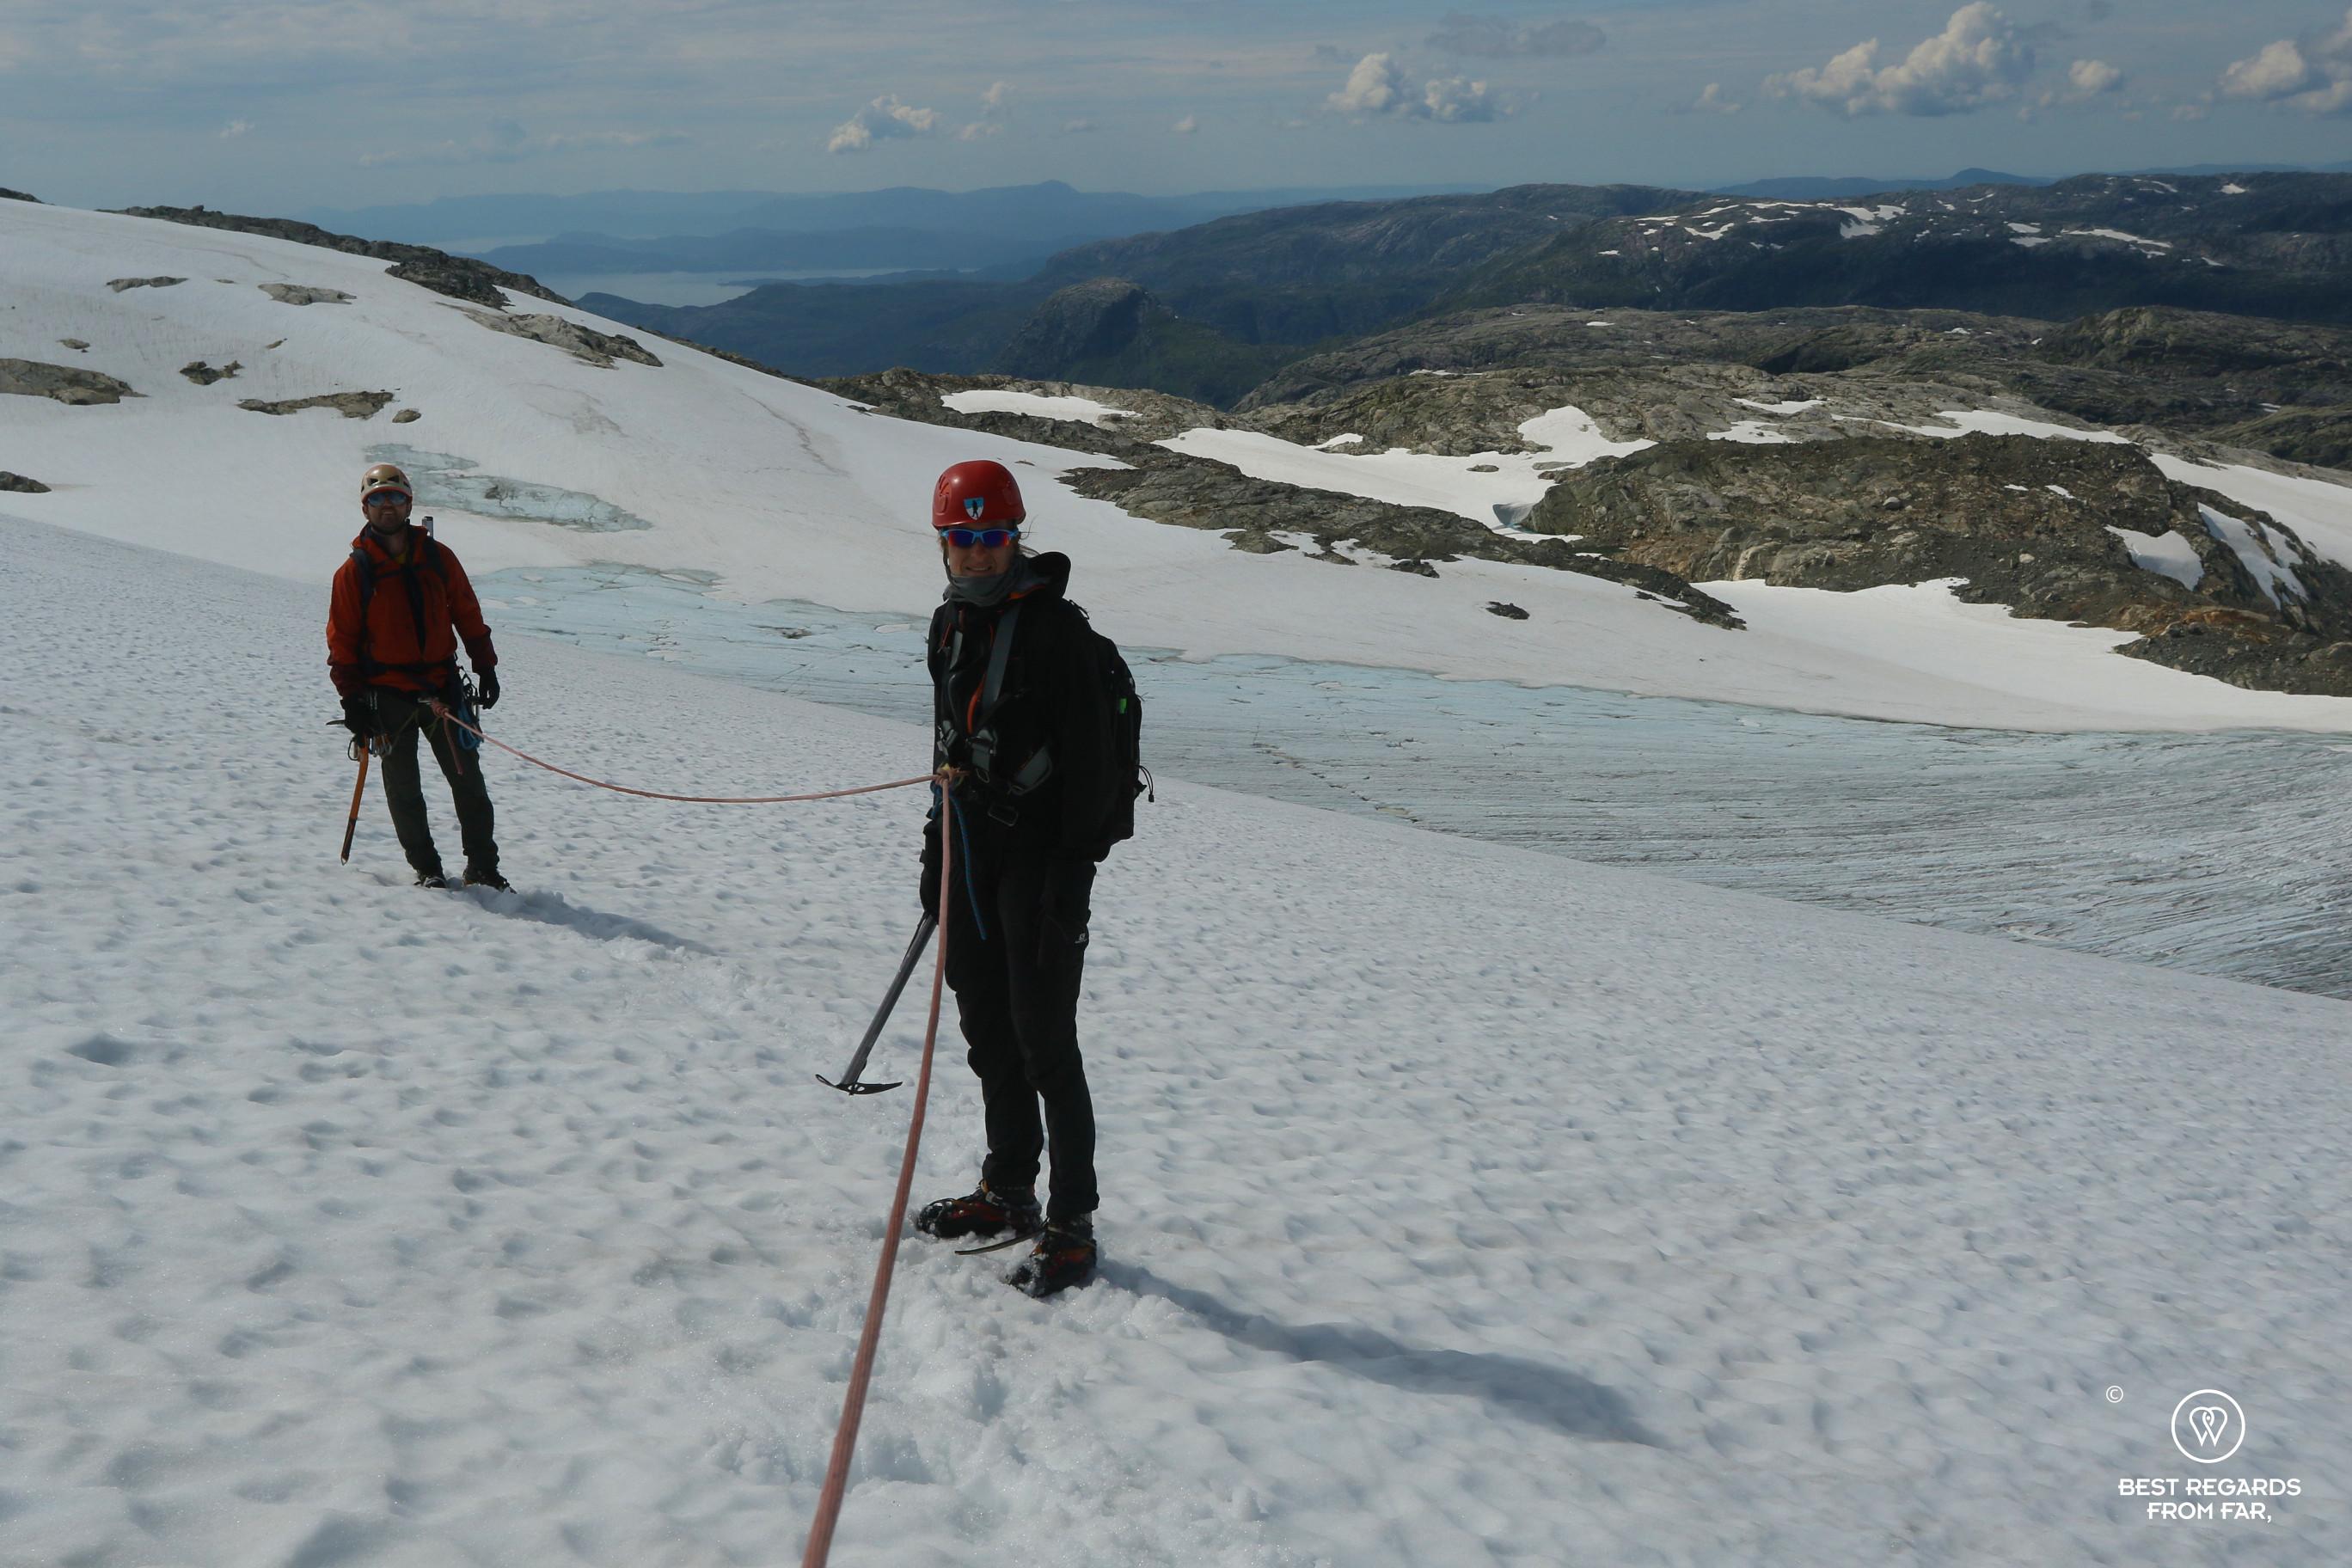 Author Marcella van Alphen progressing on the Fonna Glacier